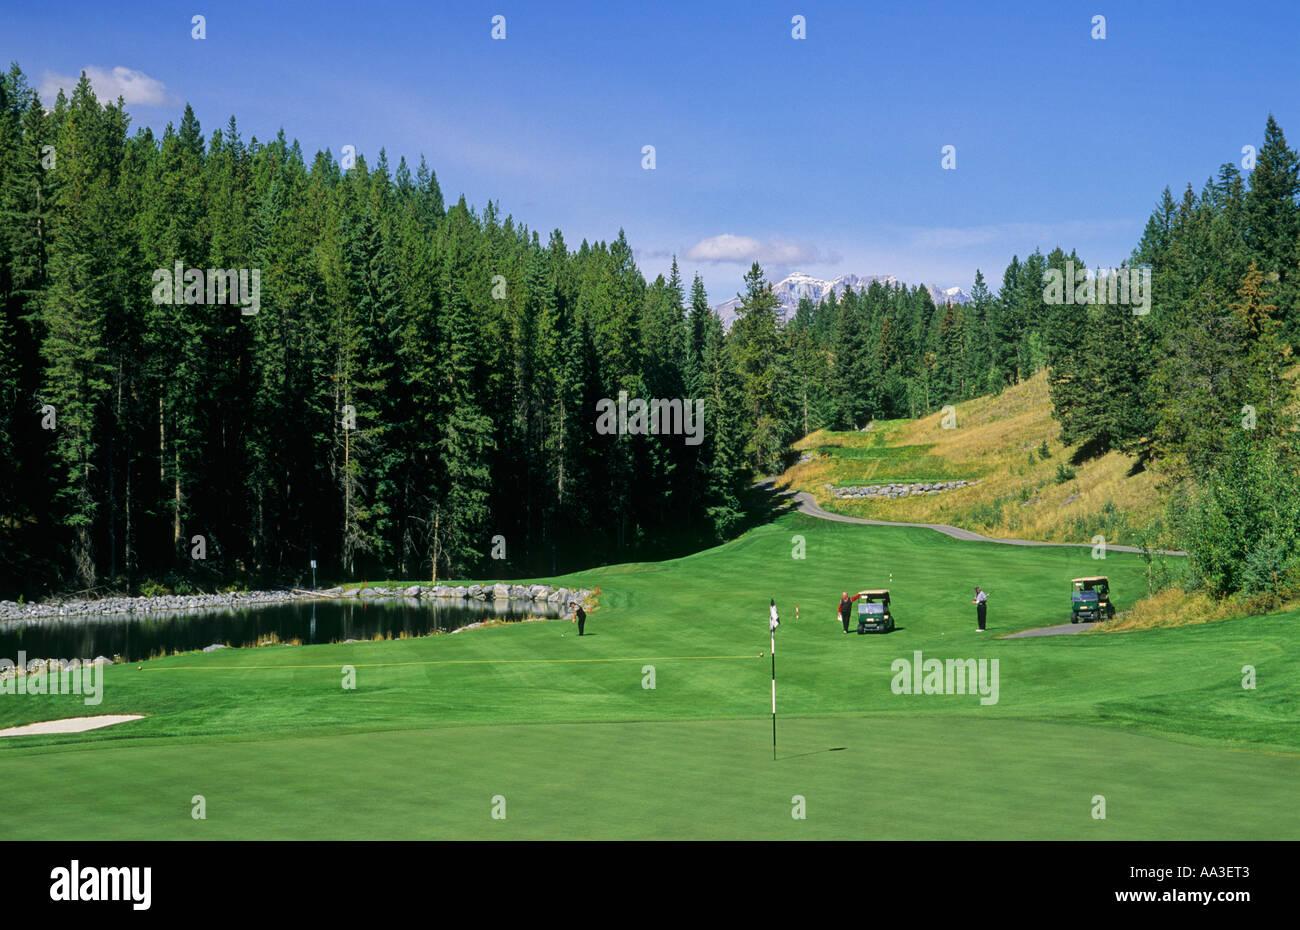 Silvertip Golf Course Canmore Alberta Canada - Stock Image